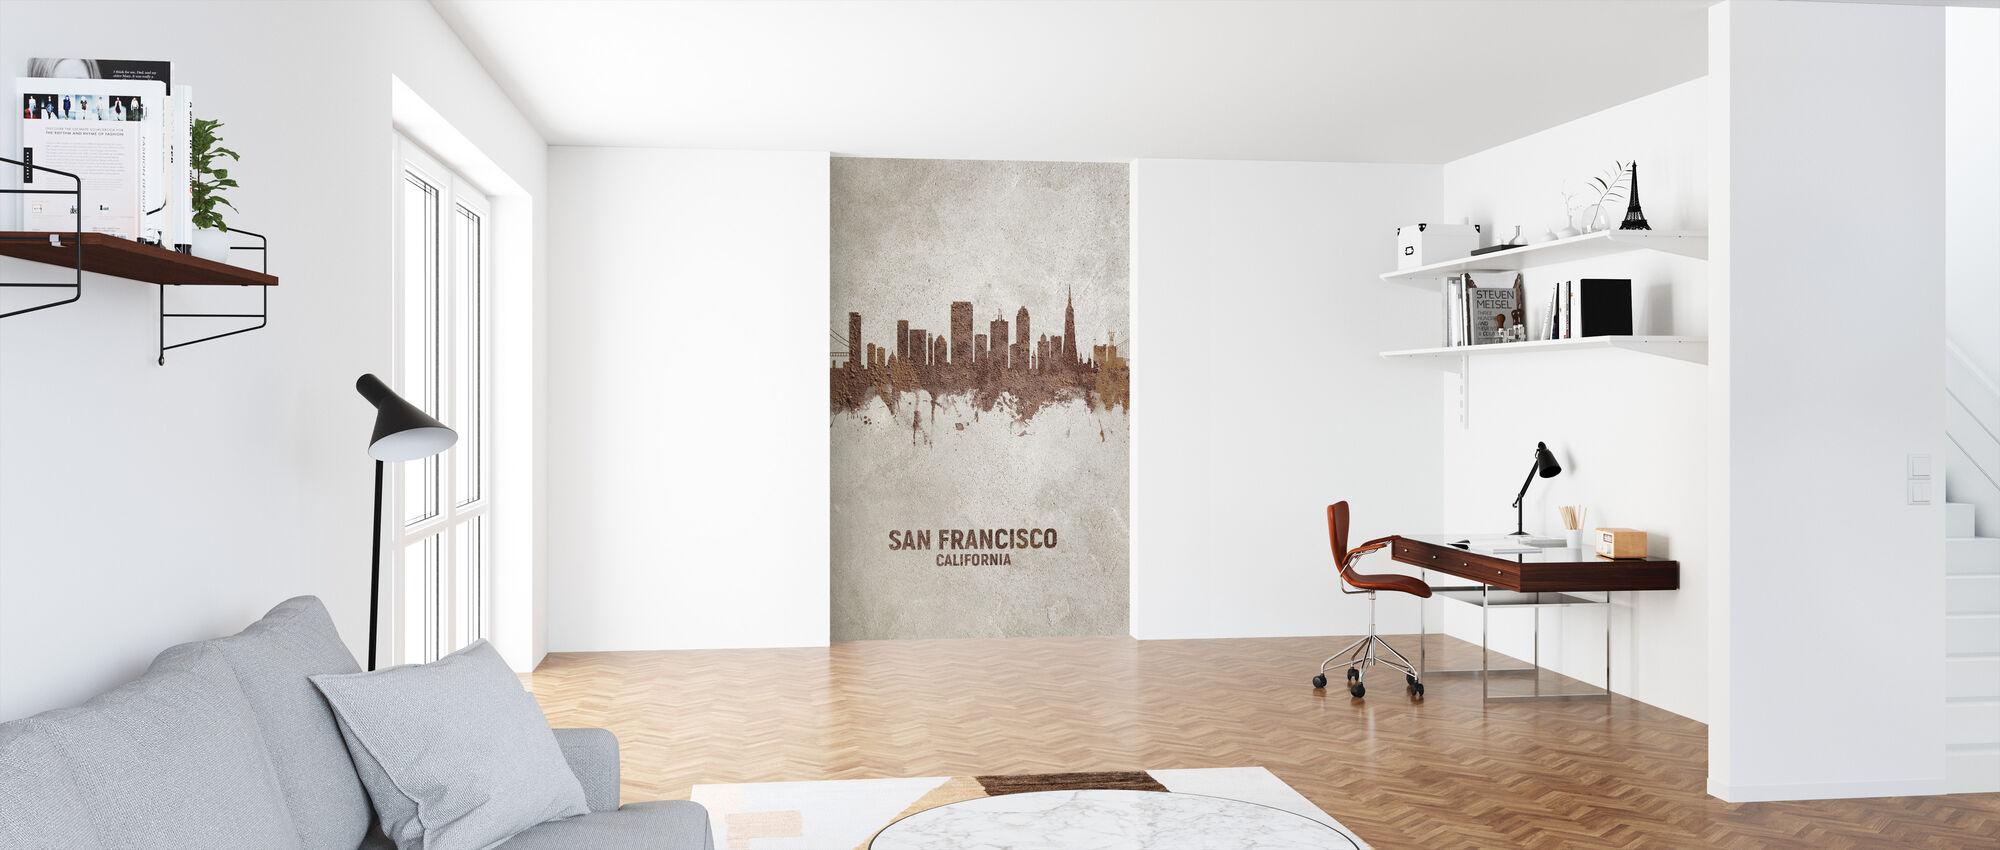 San Francisco California Rust Skyline - Wallpaper - Office